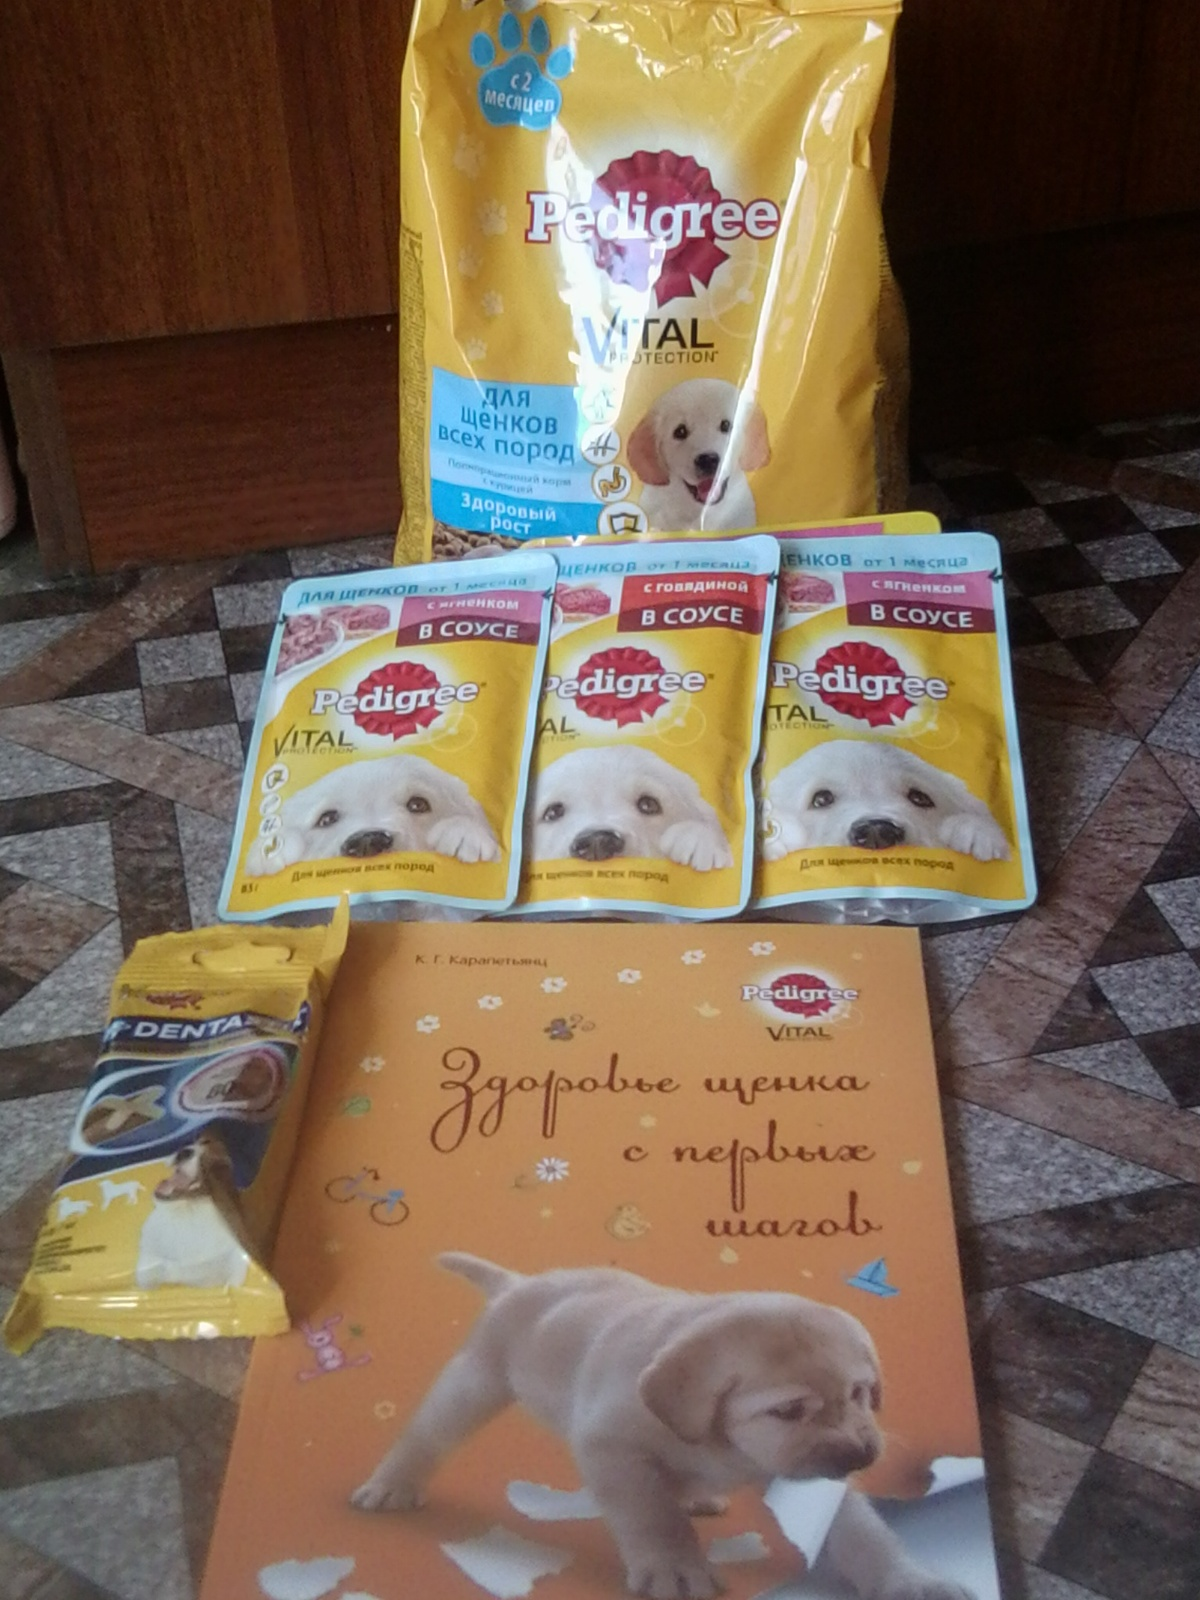 Акция Pedigree: «Pedigree для щенков» - PROACTIONS ru